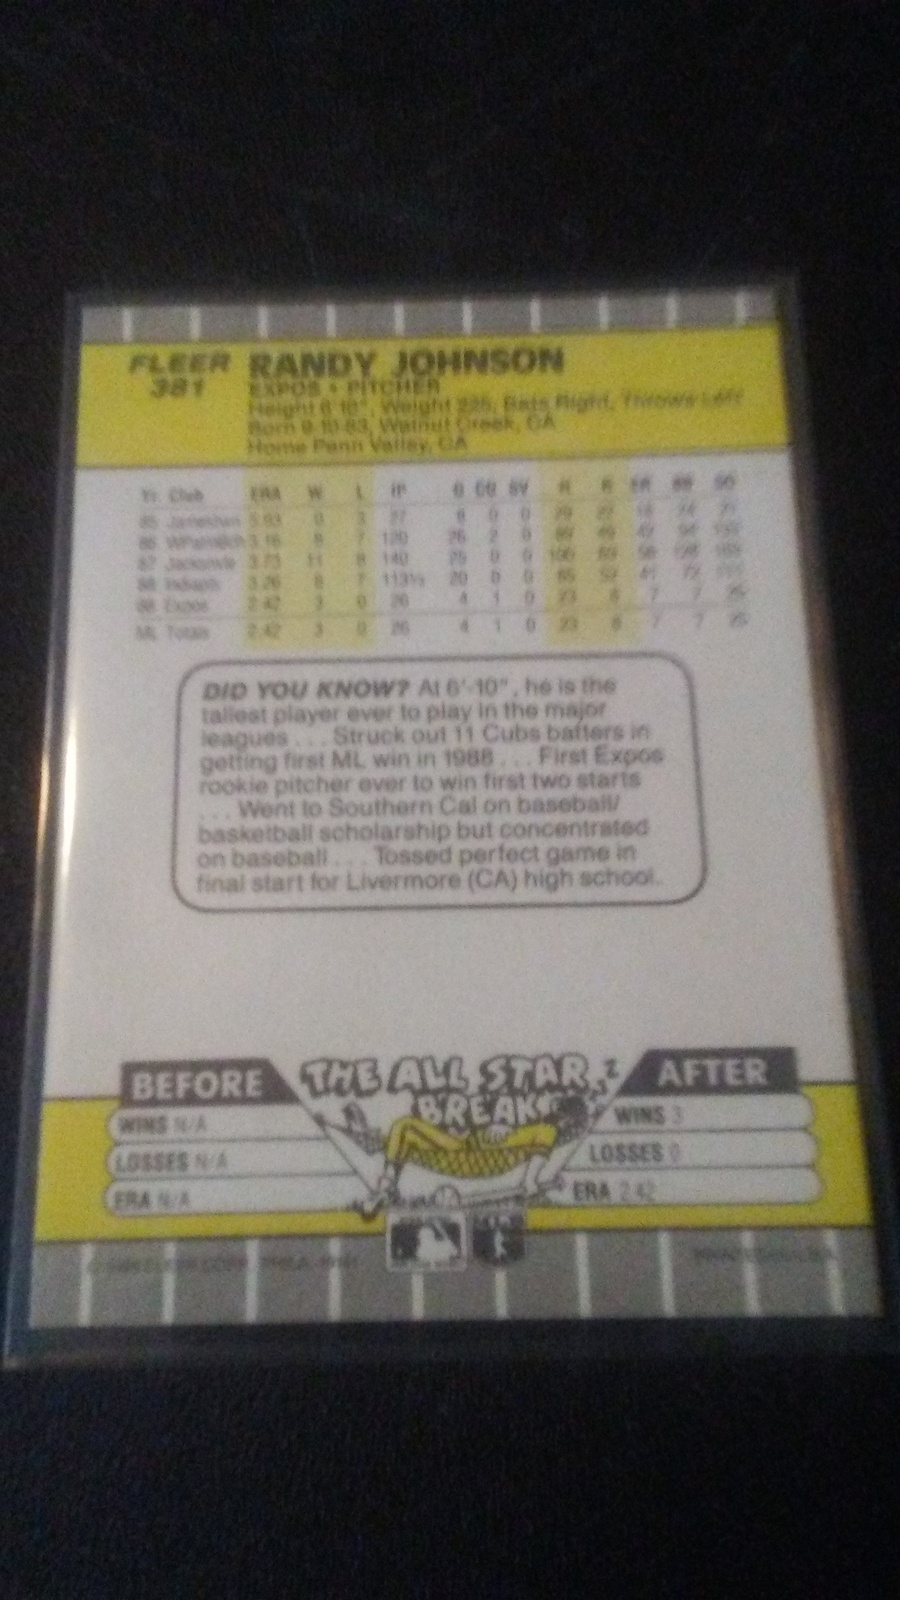 1989 Fleer Randy Johnson RC image 2